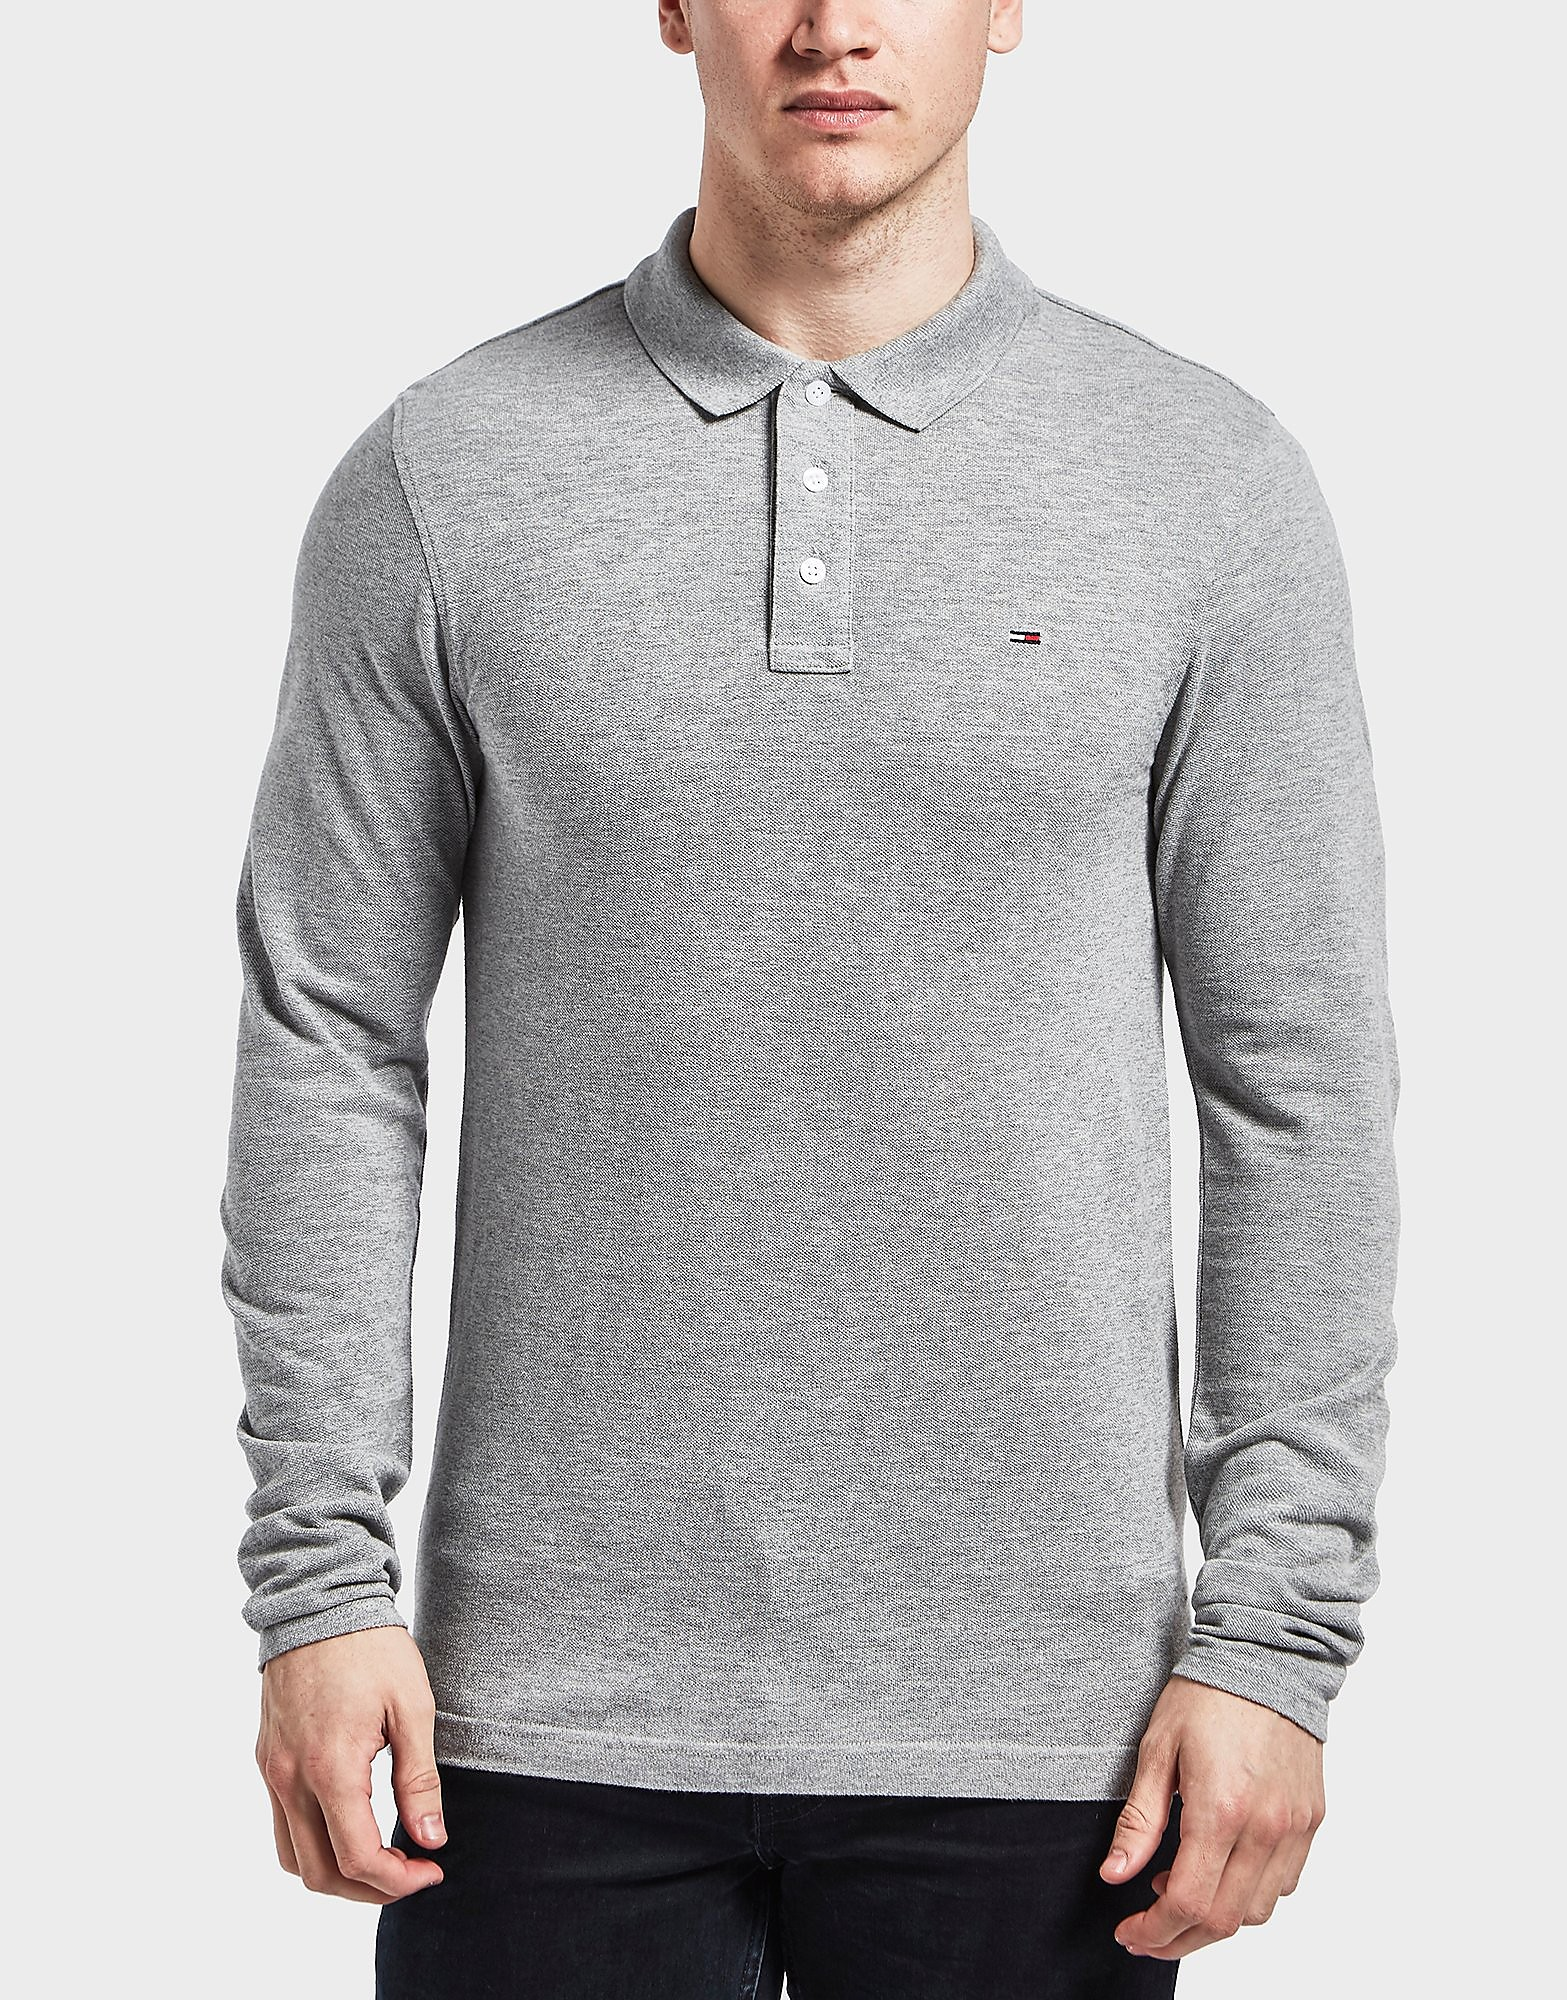 Tommy Hilfiger Long Sleeve Polo Shirt